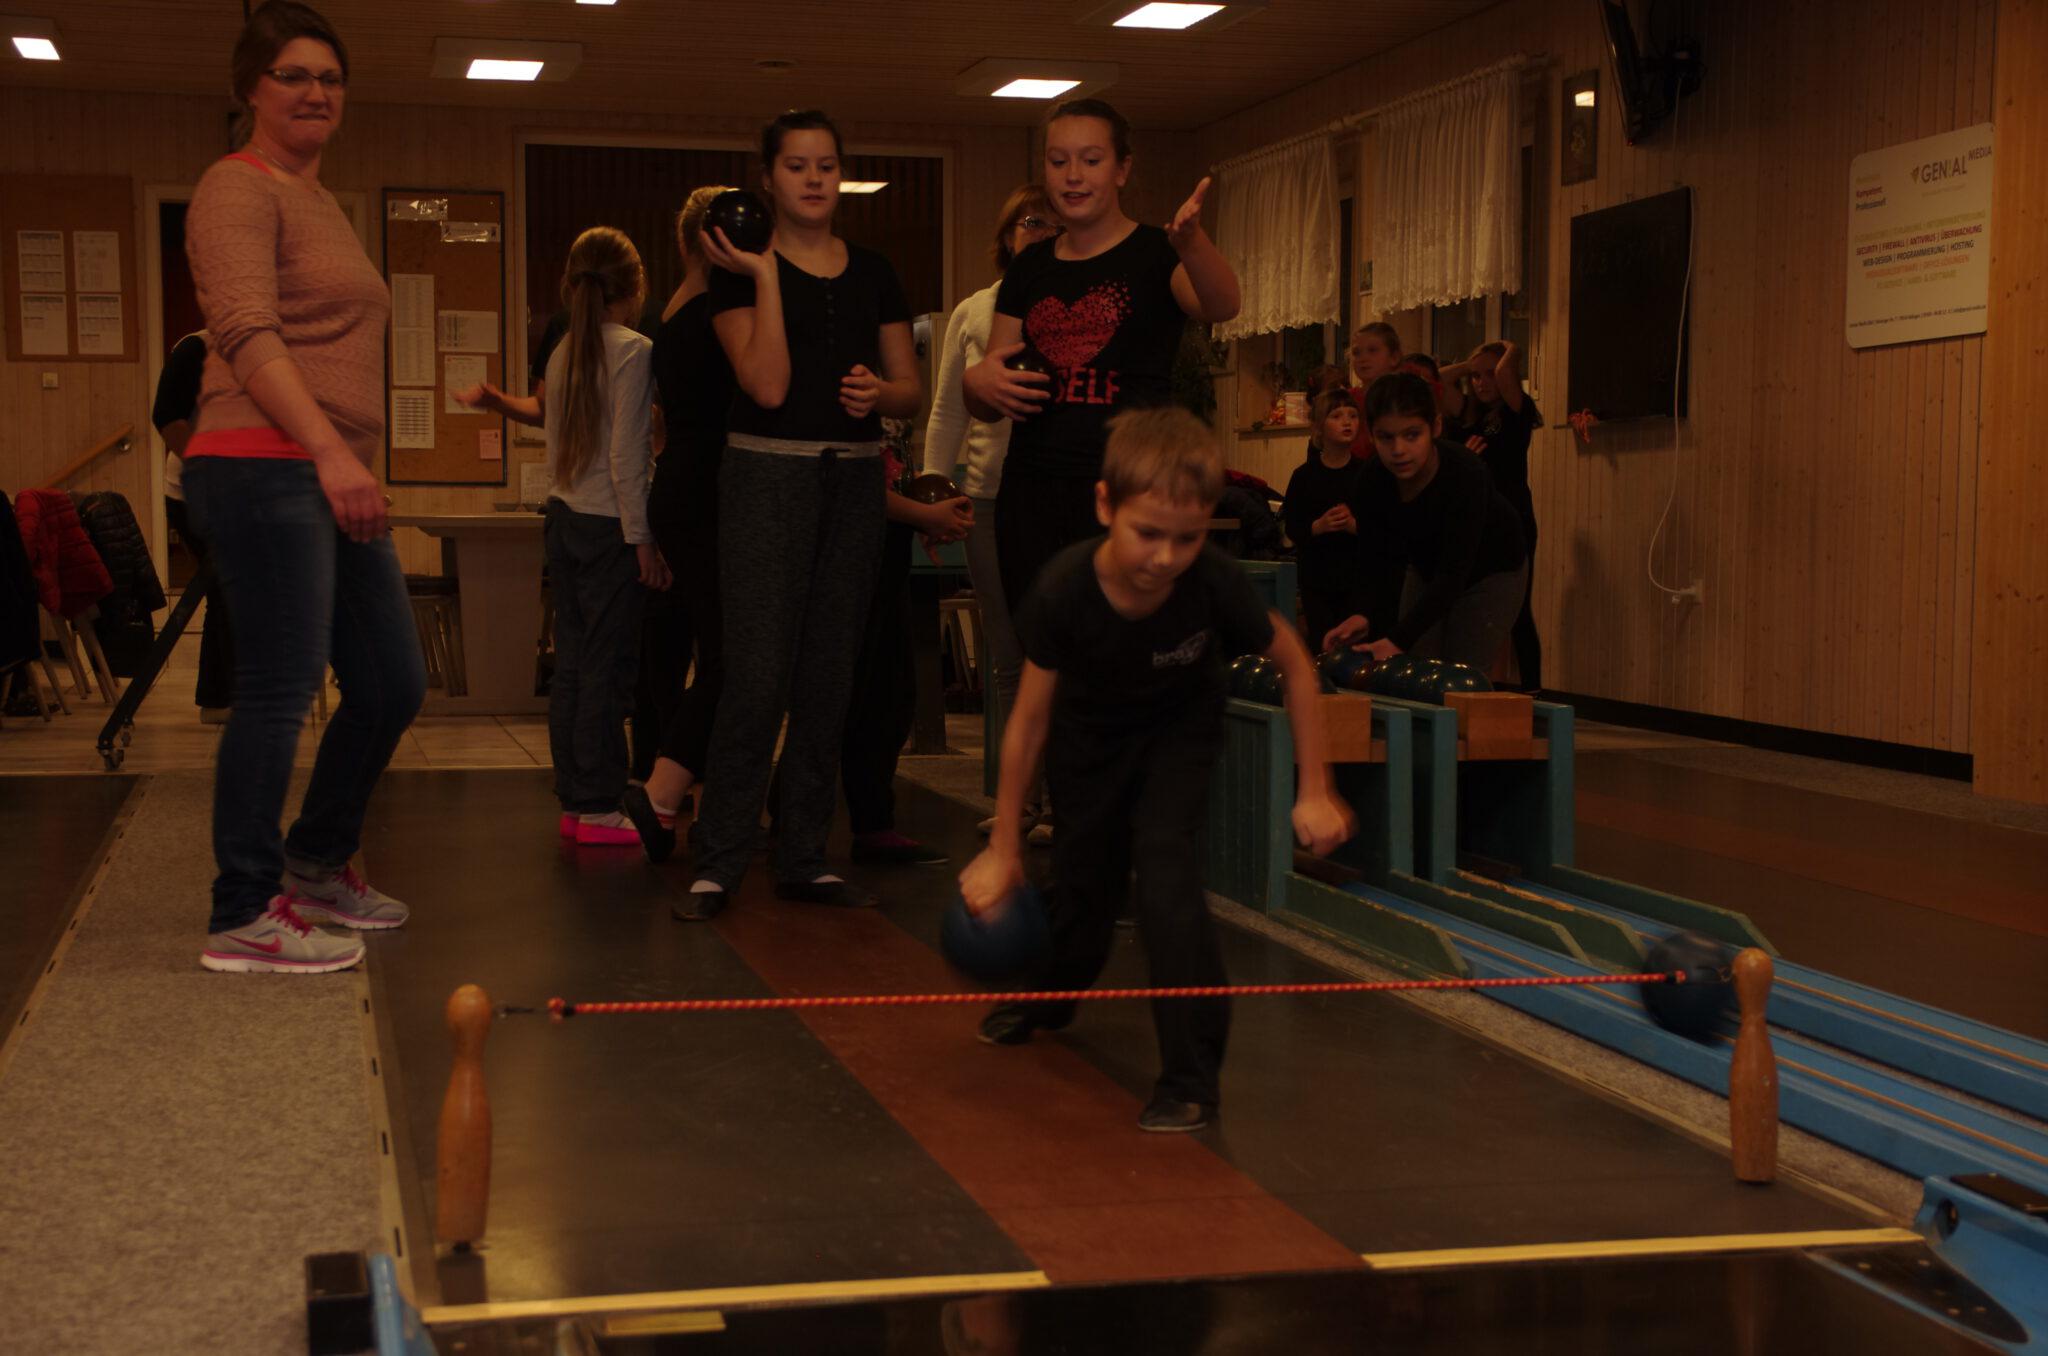 Jahr 2015. Kindertanzclub bravO. Kegelbahn.